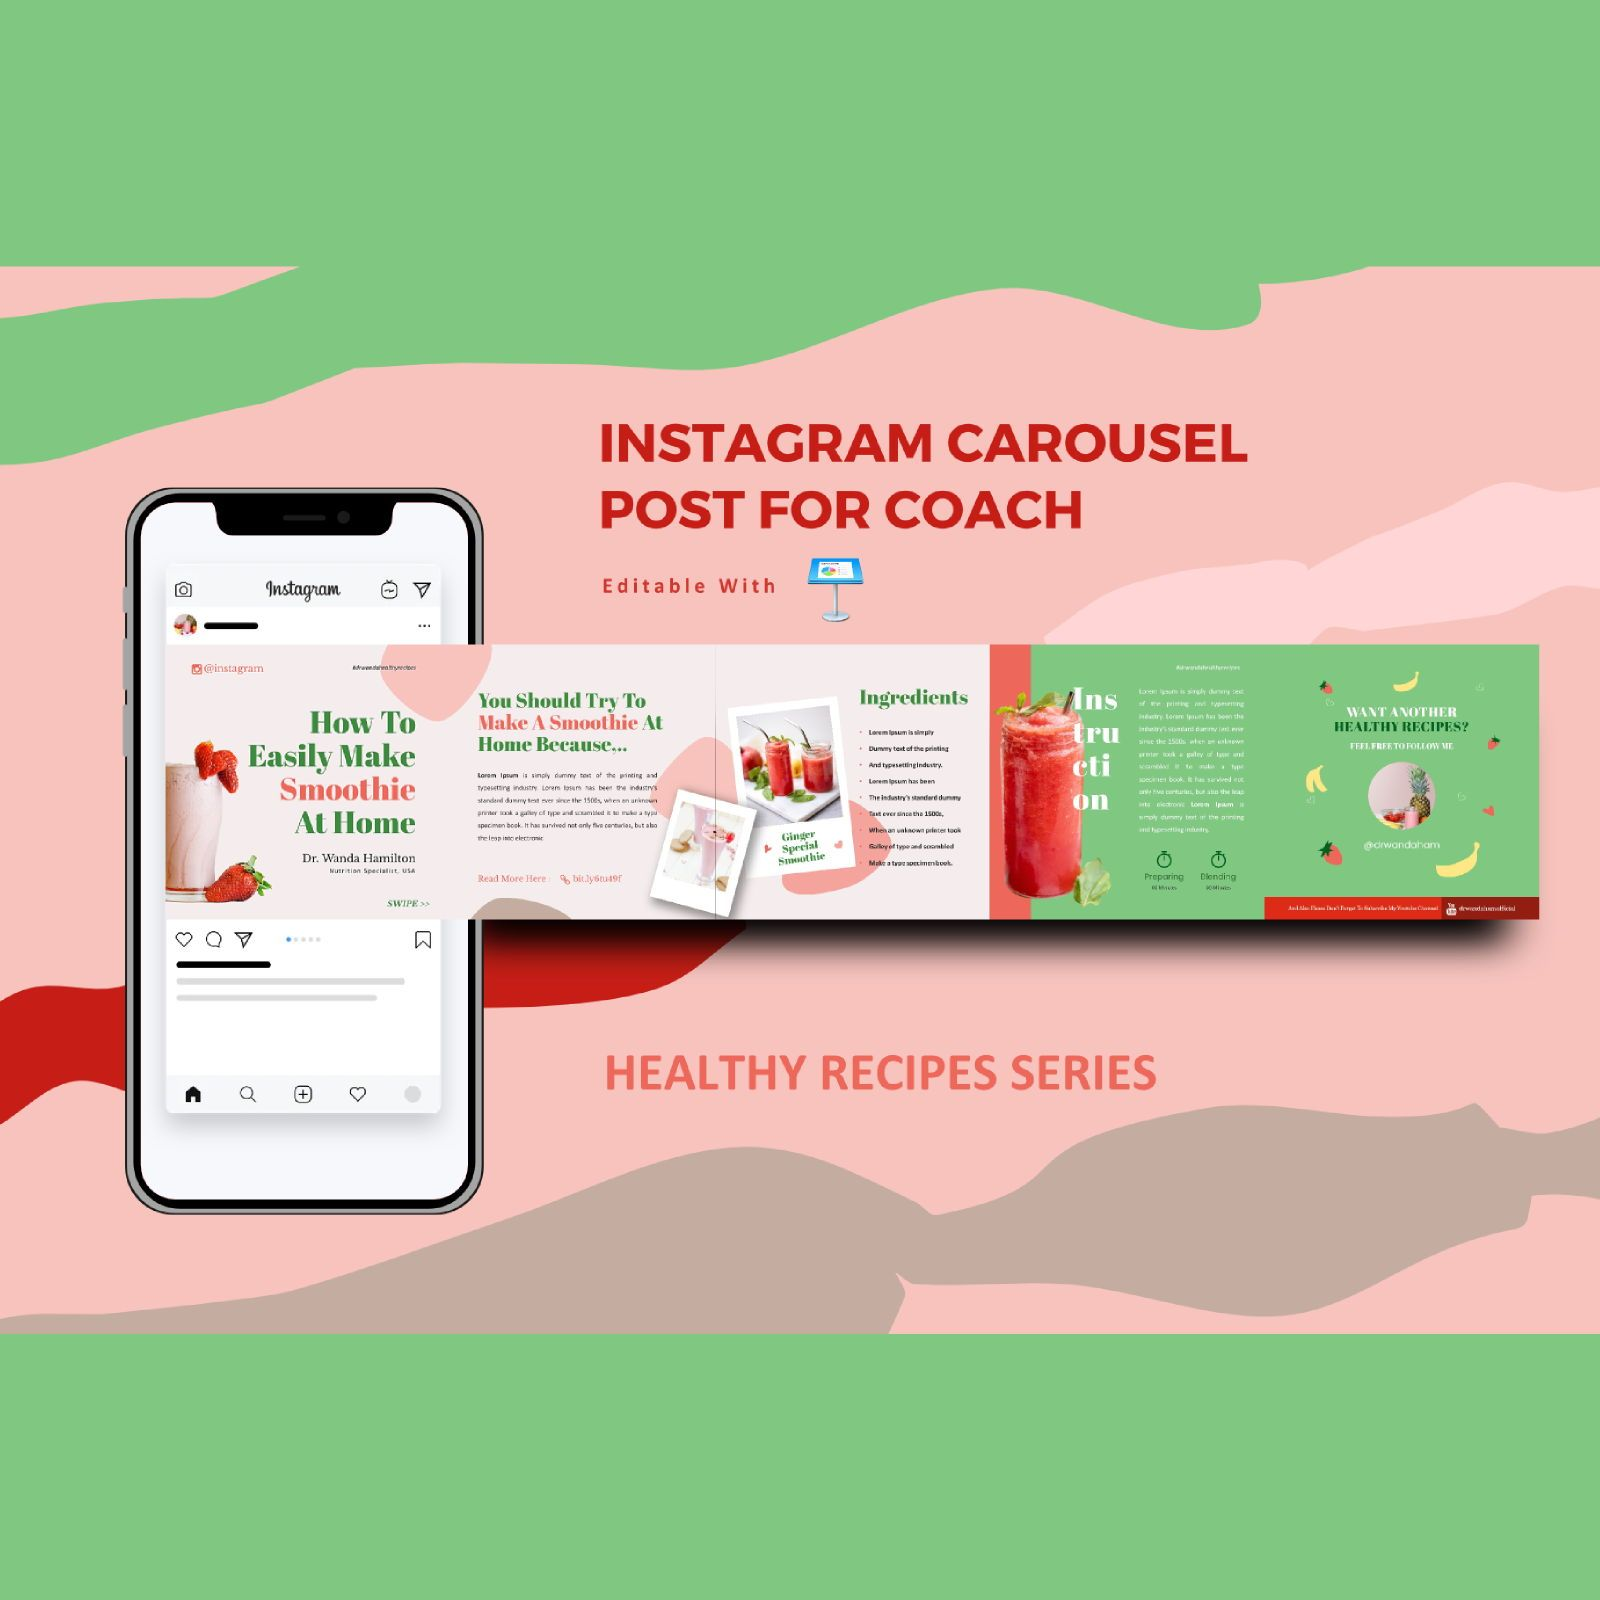 Recipe creator tips instagram carousel keynote template, 08335, Infographics — PoweredTemplate.com